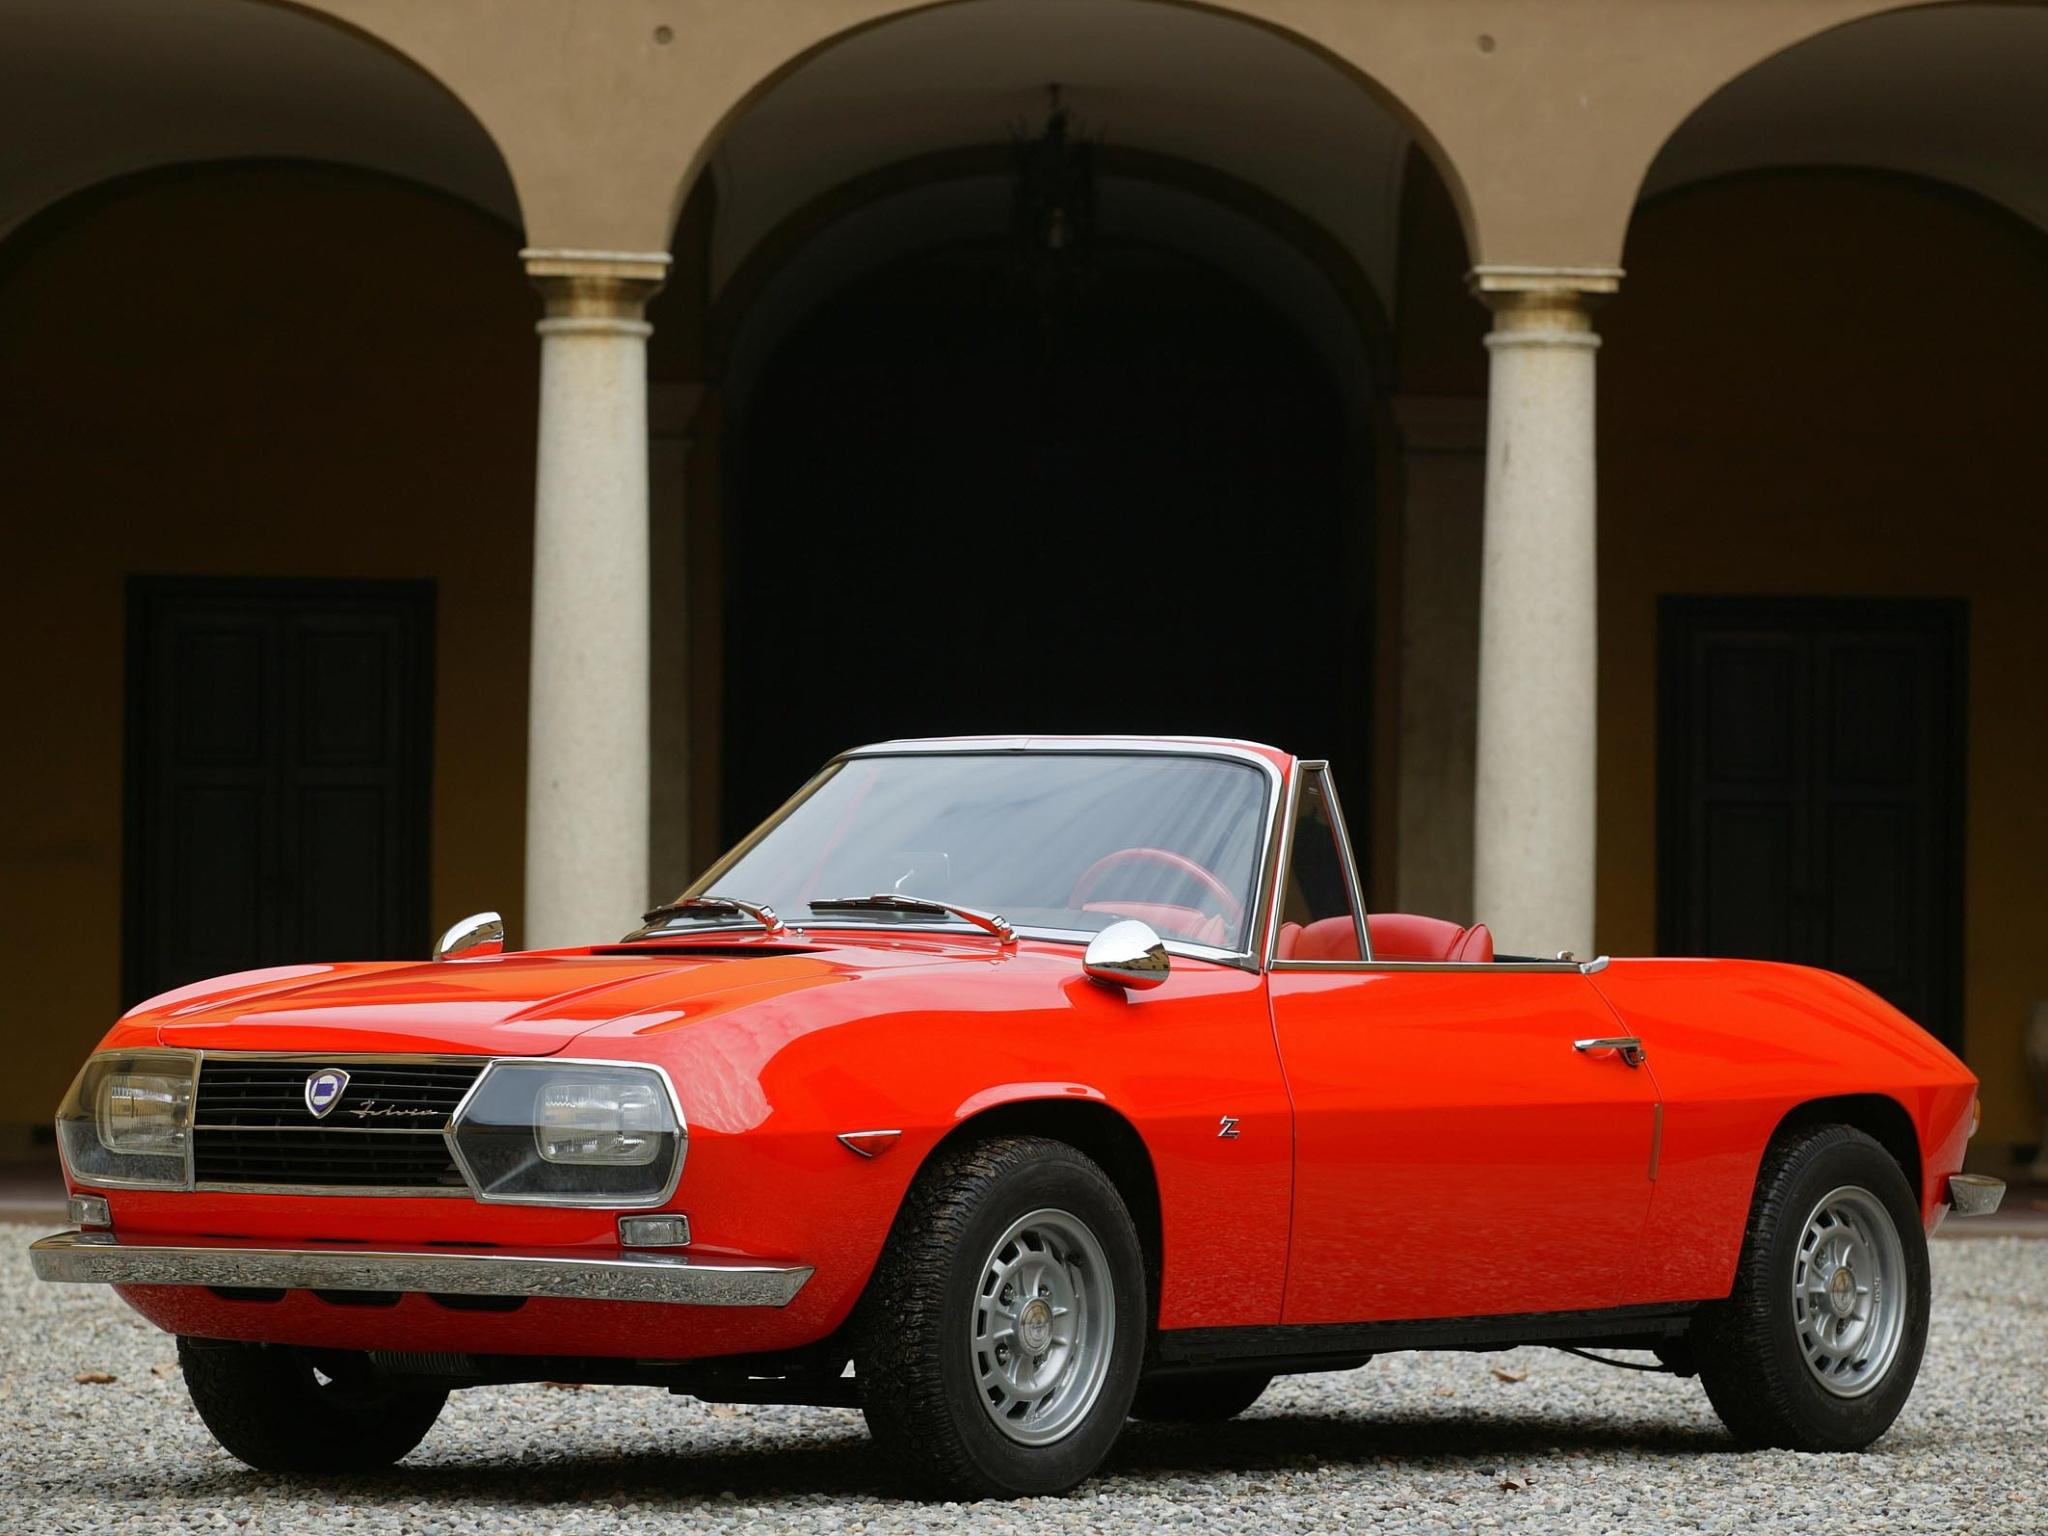 http://www.carstyling.ru/resources/studios/1968_Zagato_Lancia_Fulvia_Spider_02.jpg